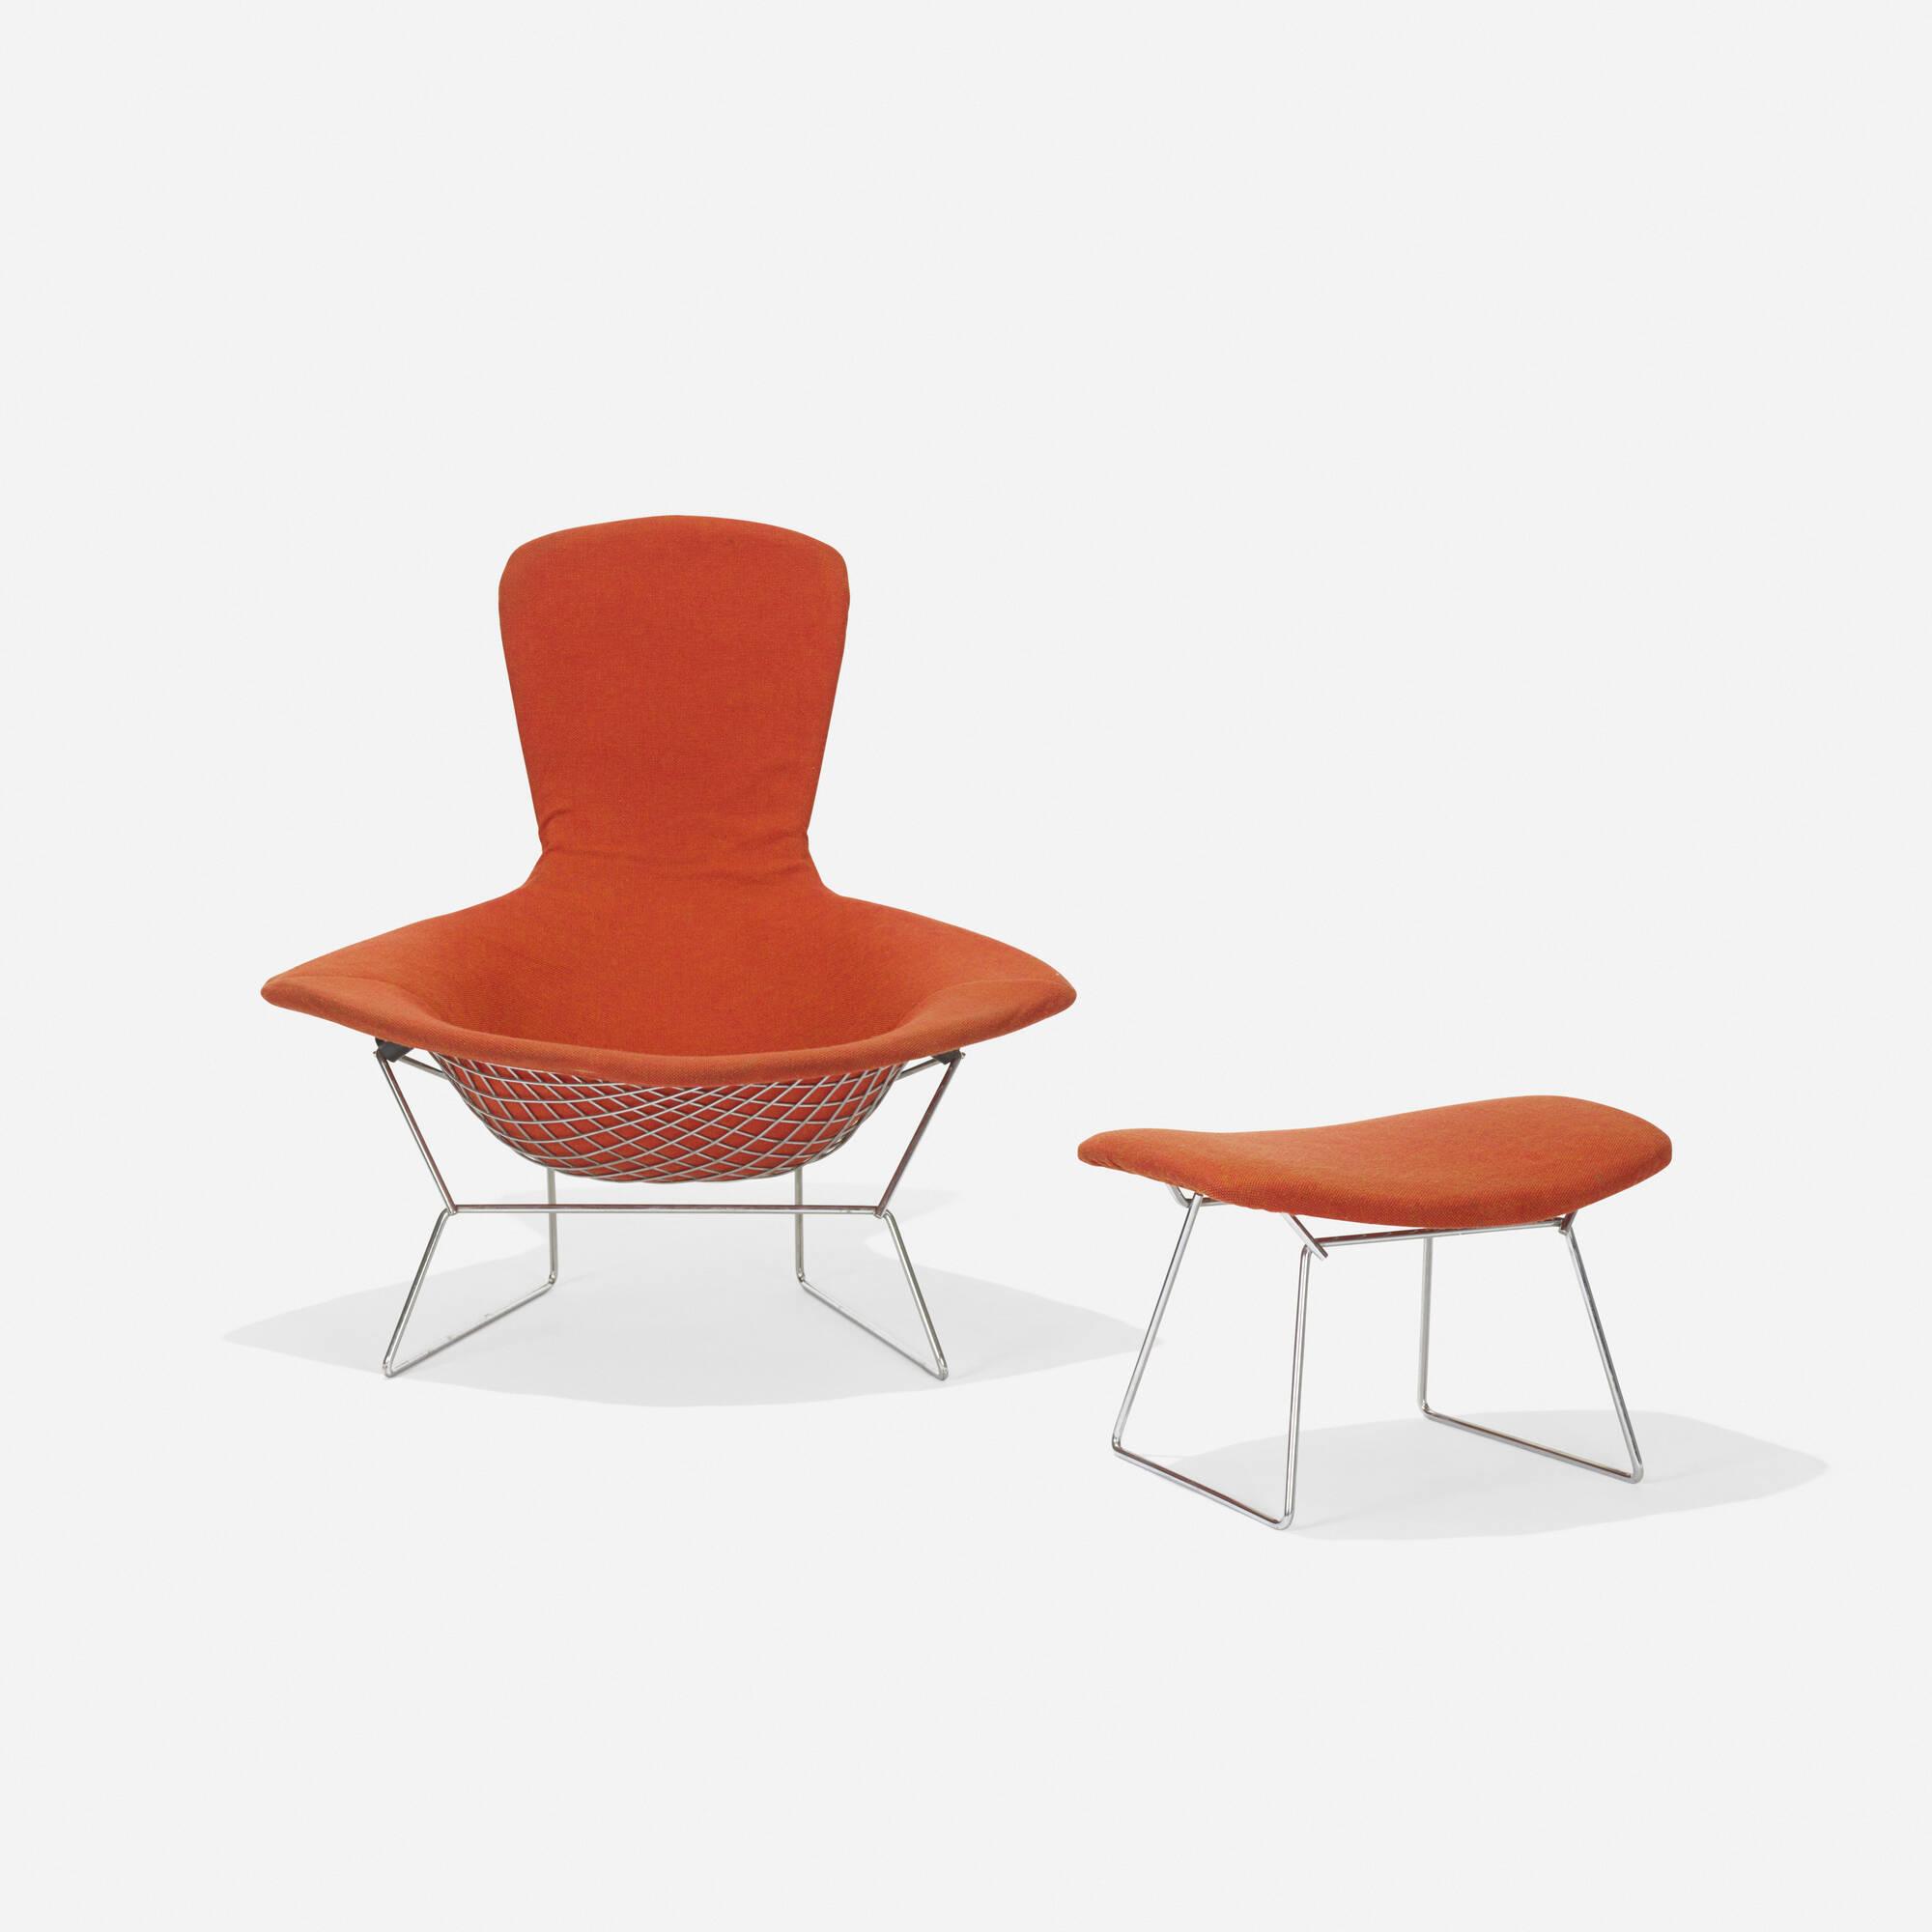 109 HARRY BERTOIA Bird chair and ottoman